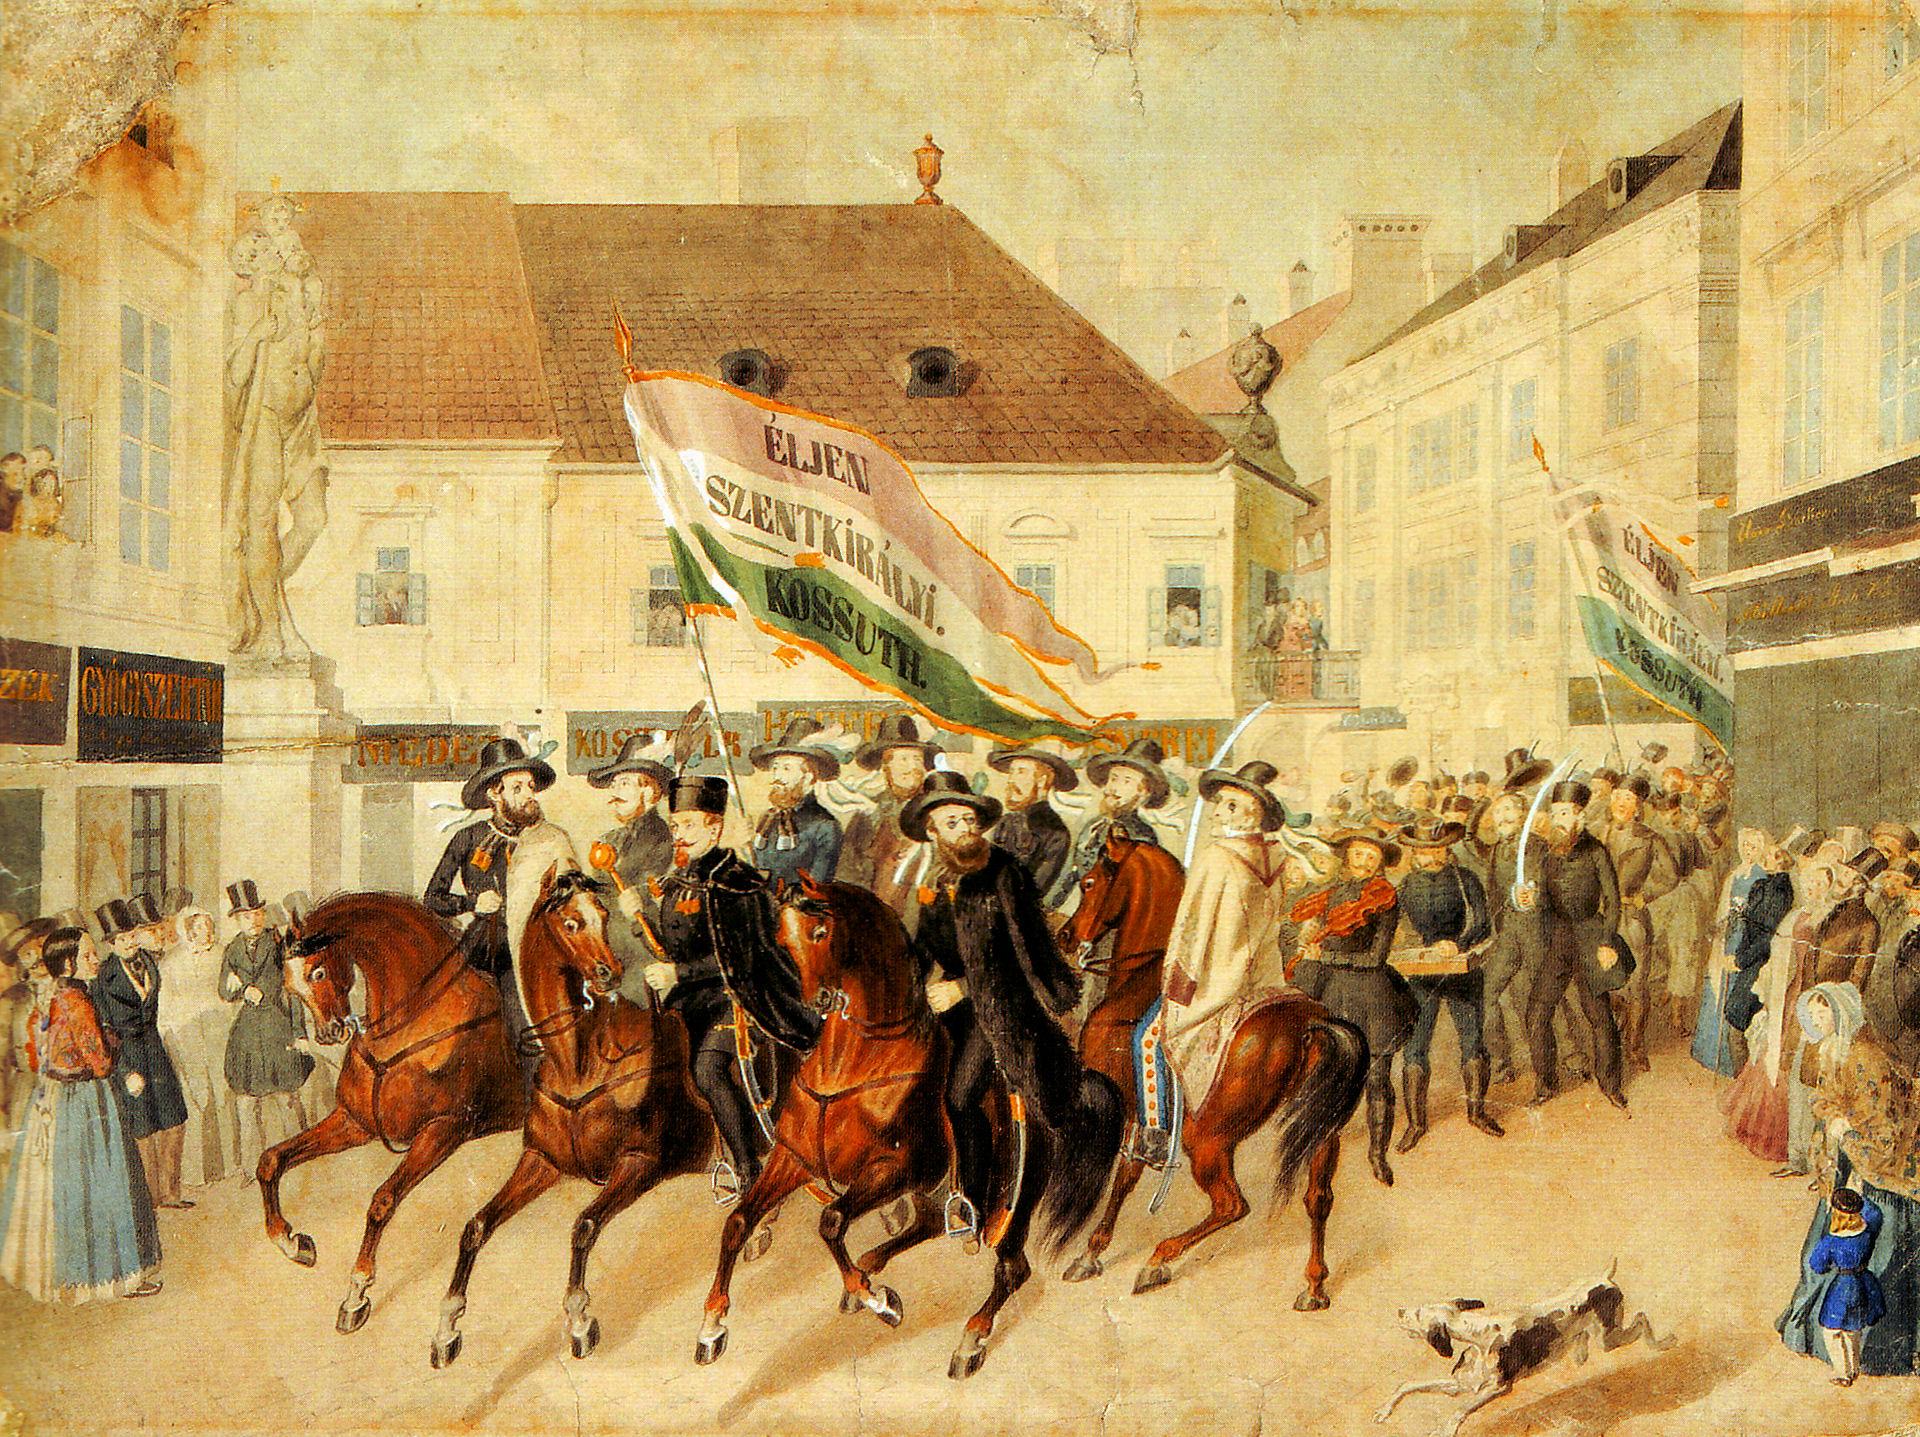 akvarellje English: Election parade at Kristóf Square, Pest, 1848 aquarell by Miklós Barabás Date 1848 körül / ca. 1848 Source/Photographer Self-scanned